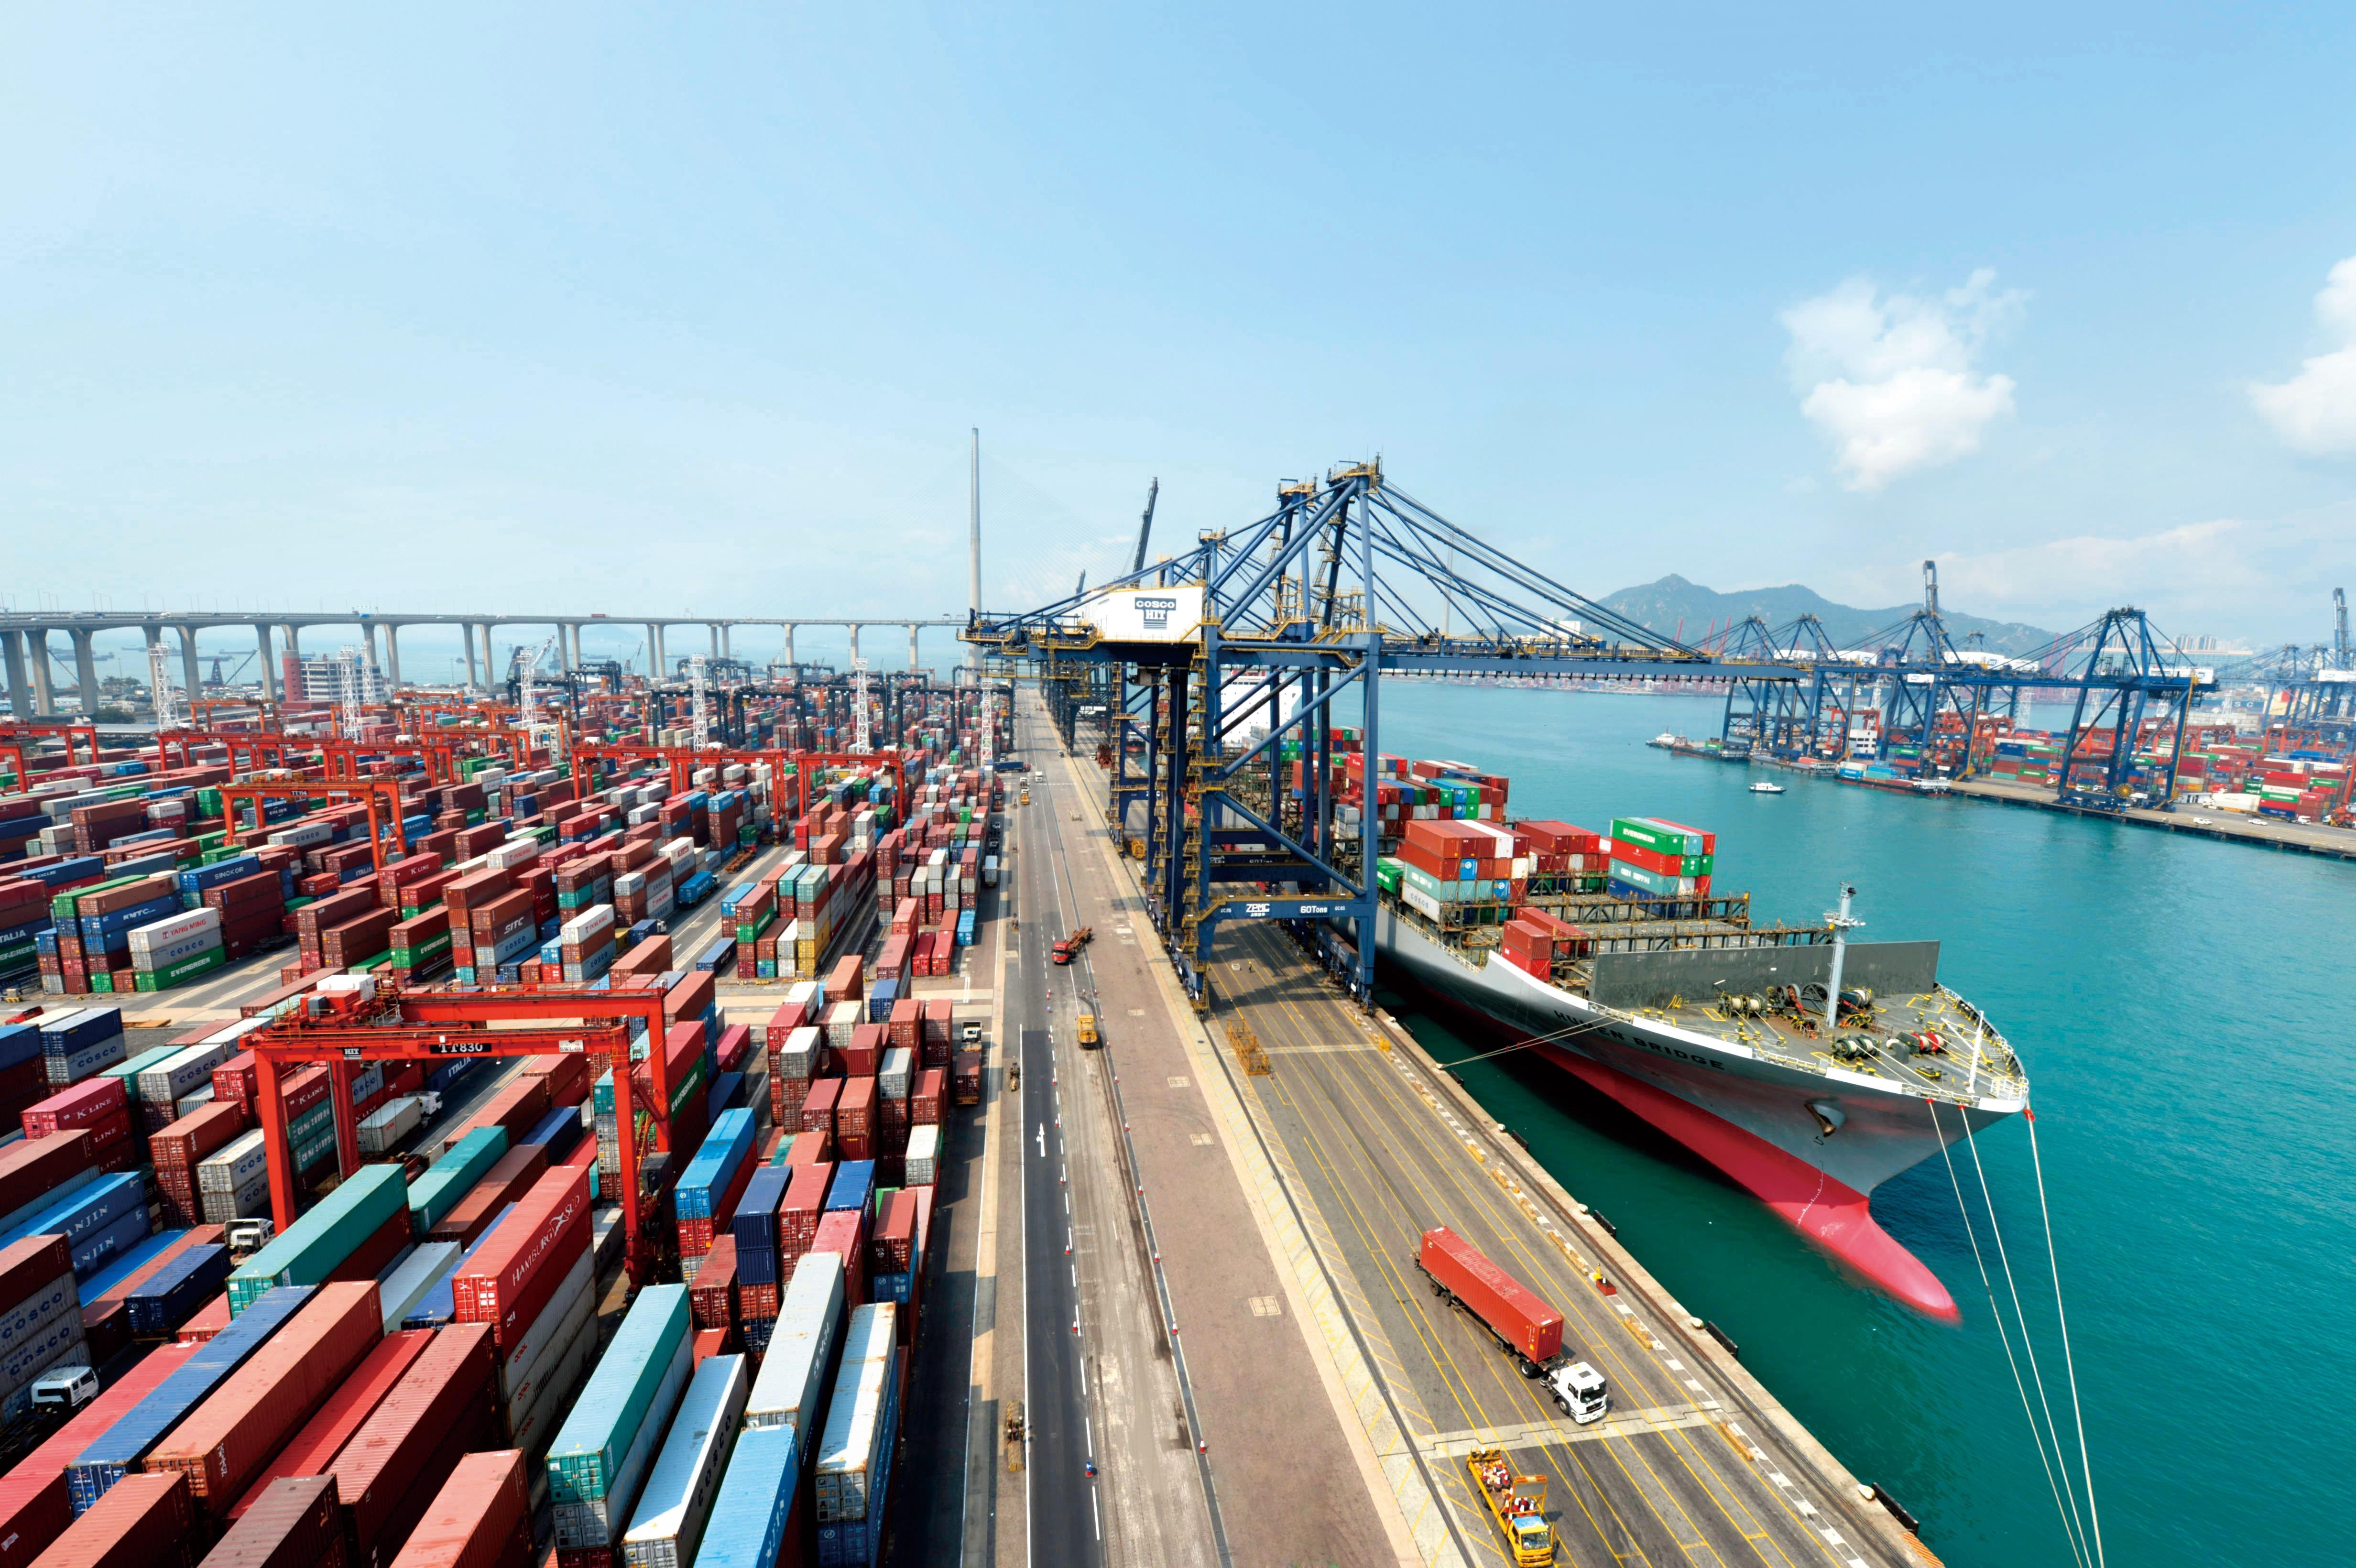 COSCO SHIPPING Ports Limited | LinkedIn